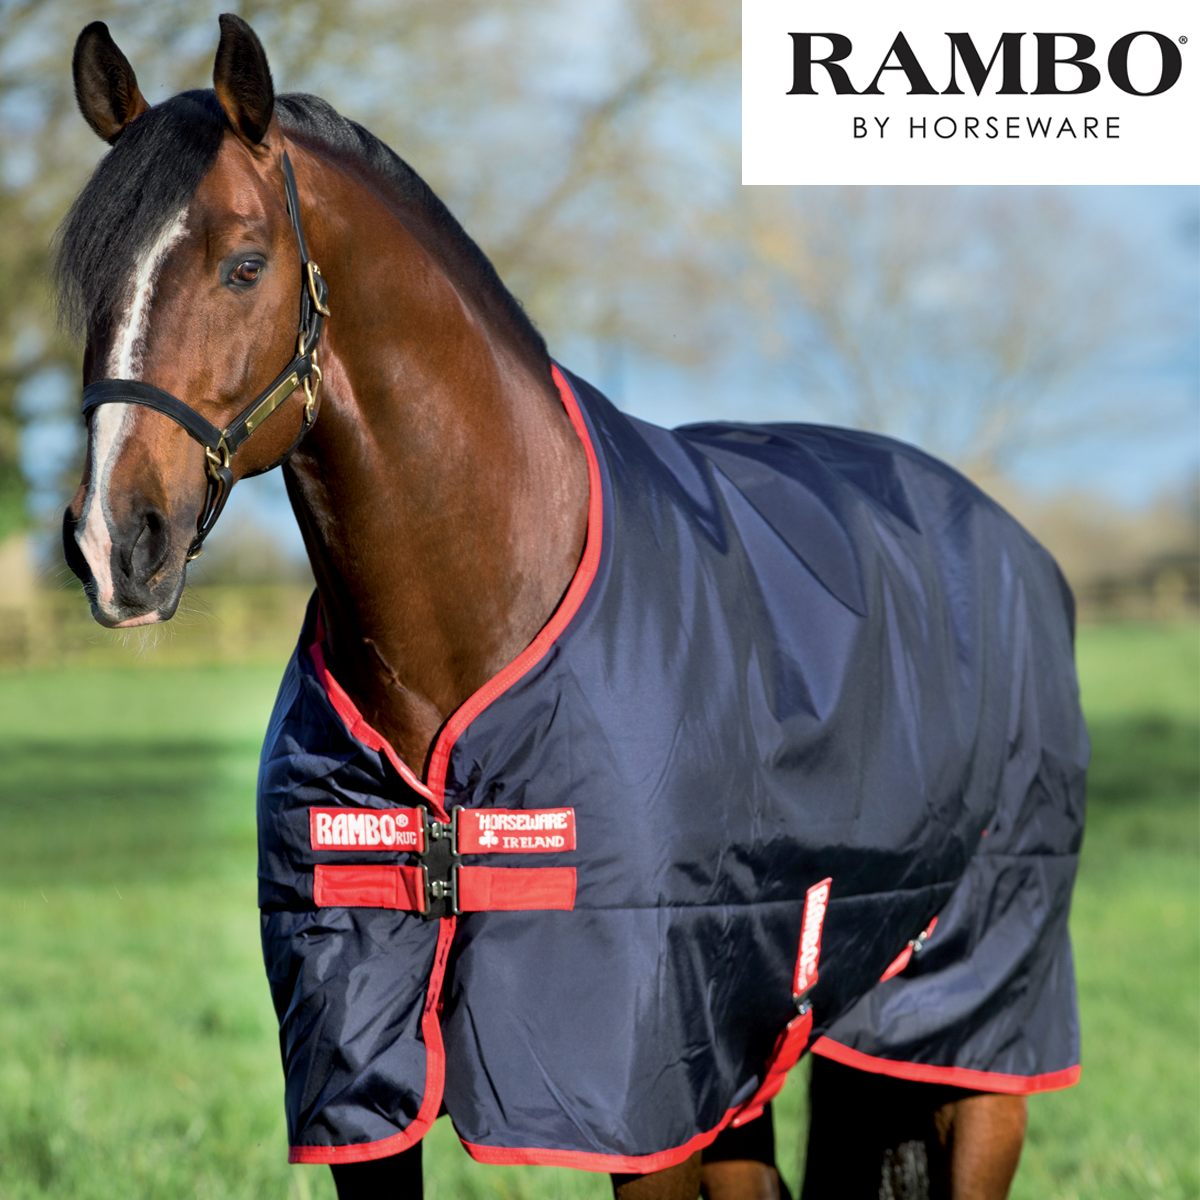 Horseware Rambo Original Mediumweight Turnout Turnout Mediumweight Rug (200g) 407ee3